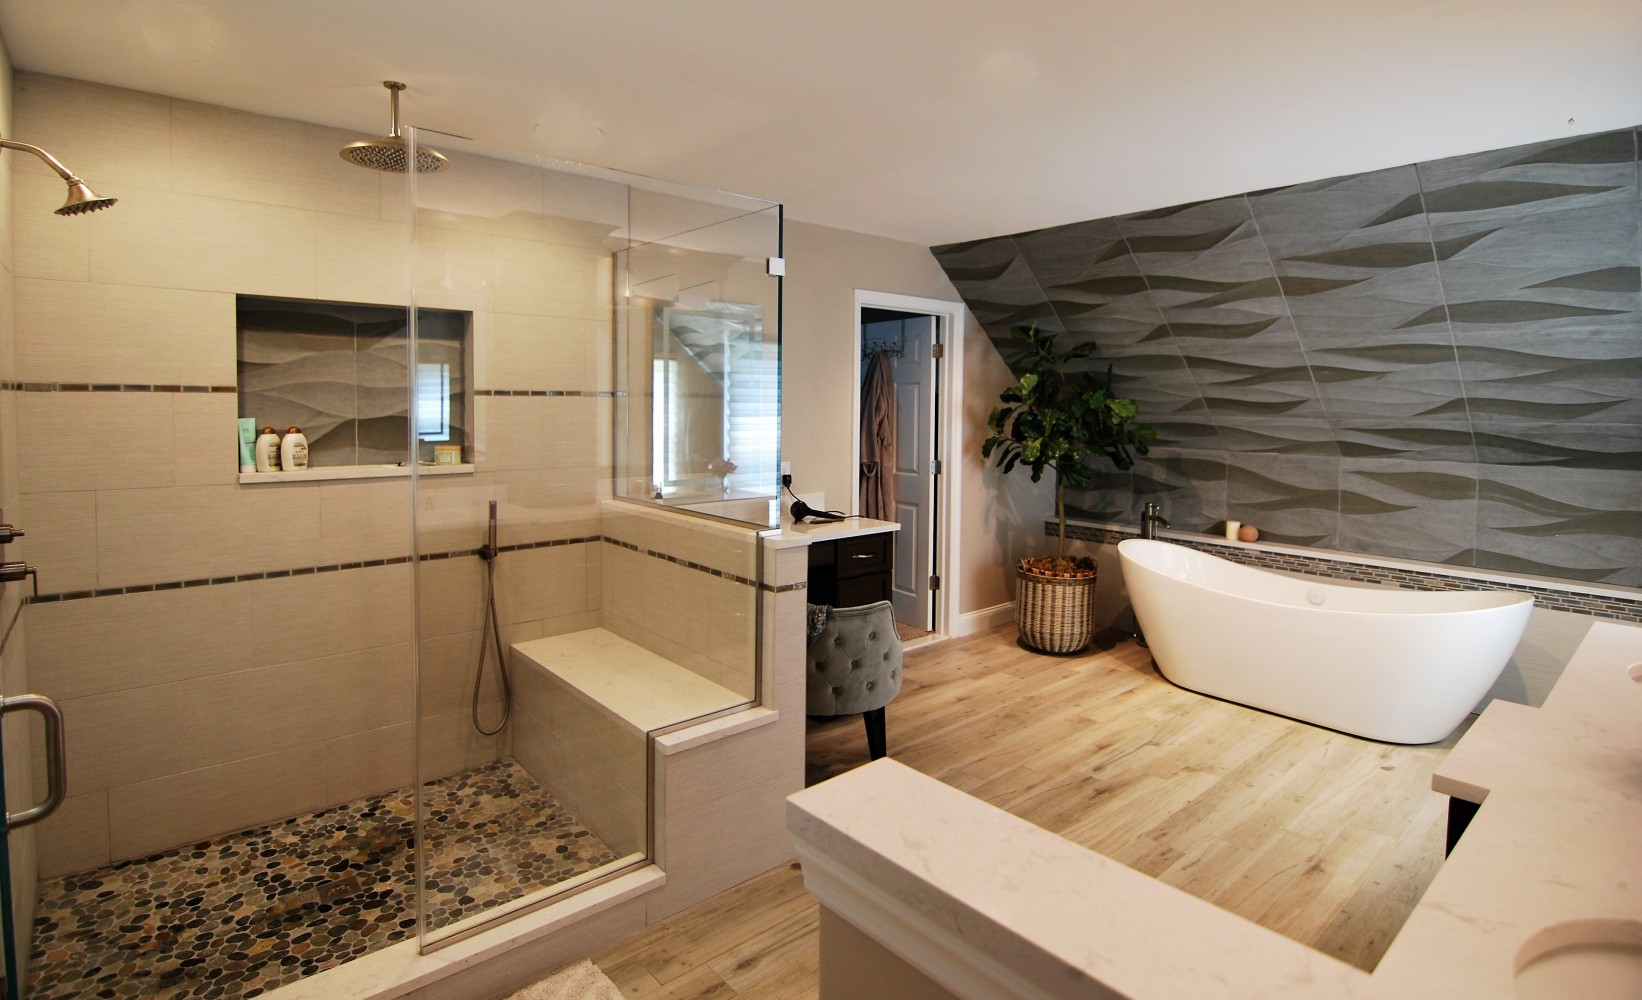 Wave Tile Bathroom Design Cranbury Nj Distinctive Interior Designs